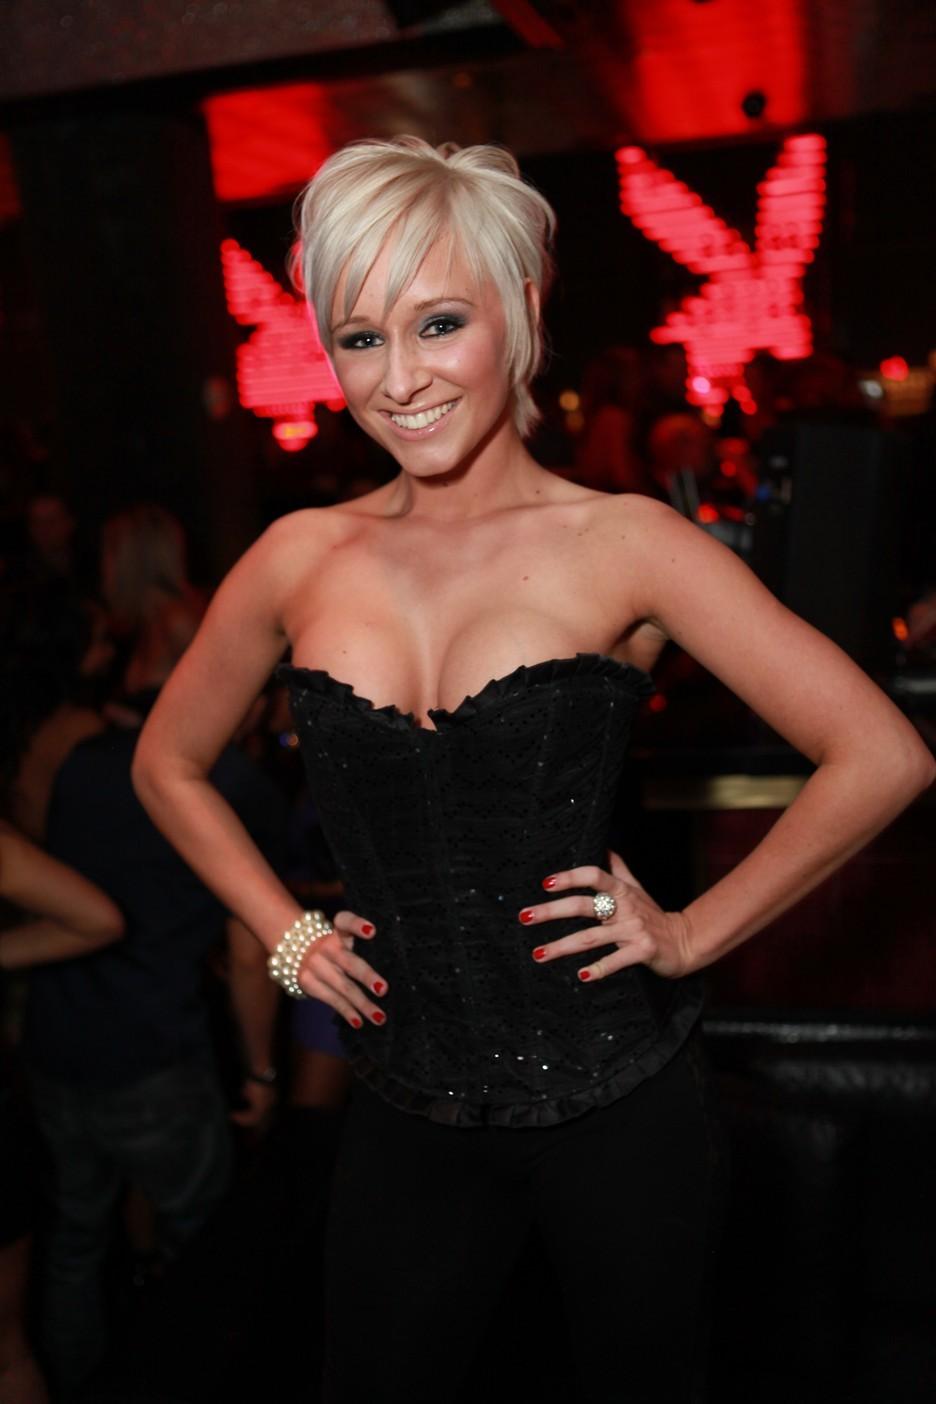 Miss Playboy Club 2010 - Miss Playboy Club January 2010